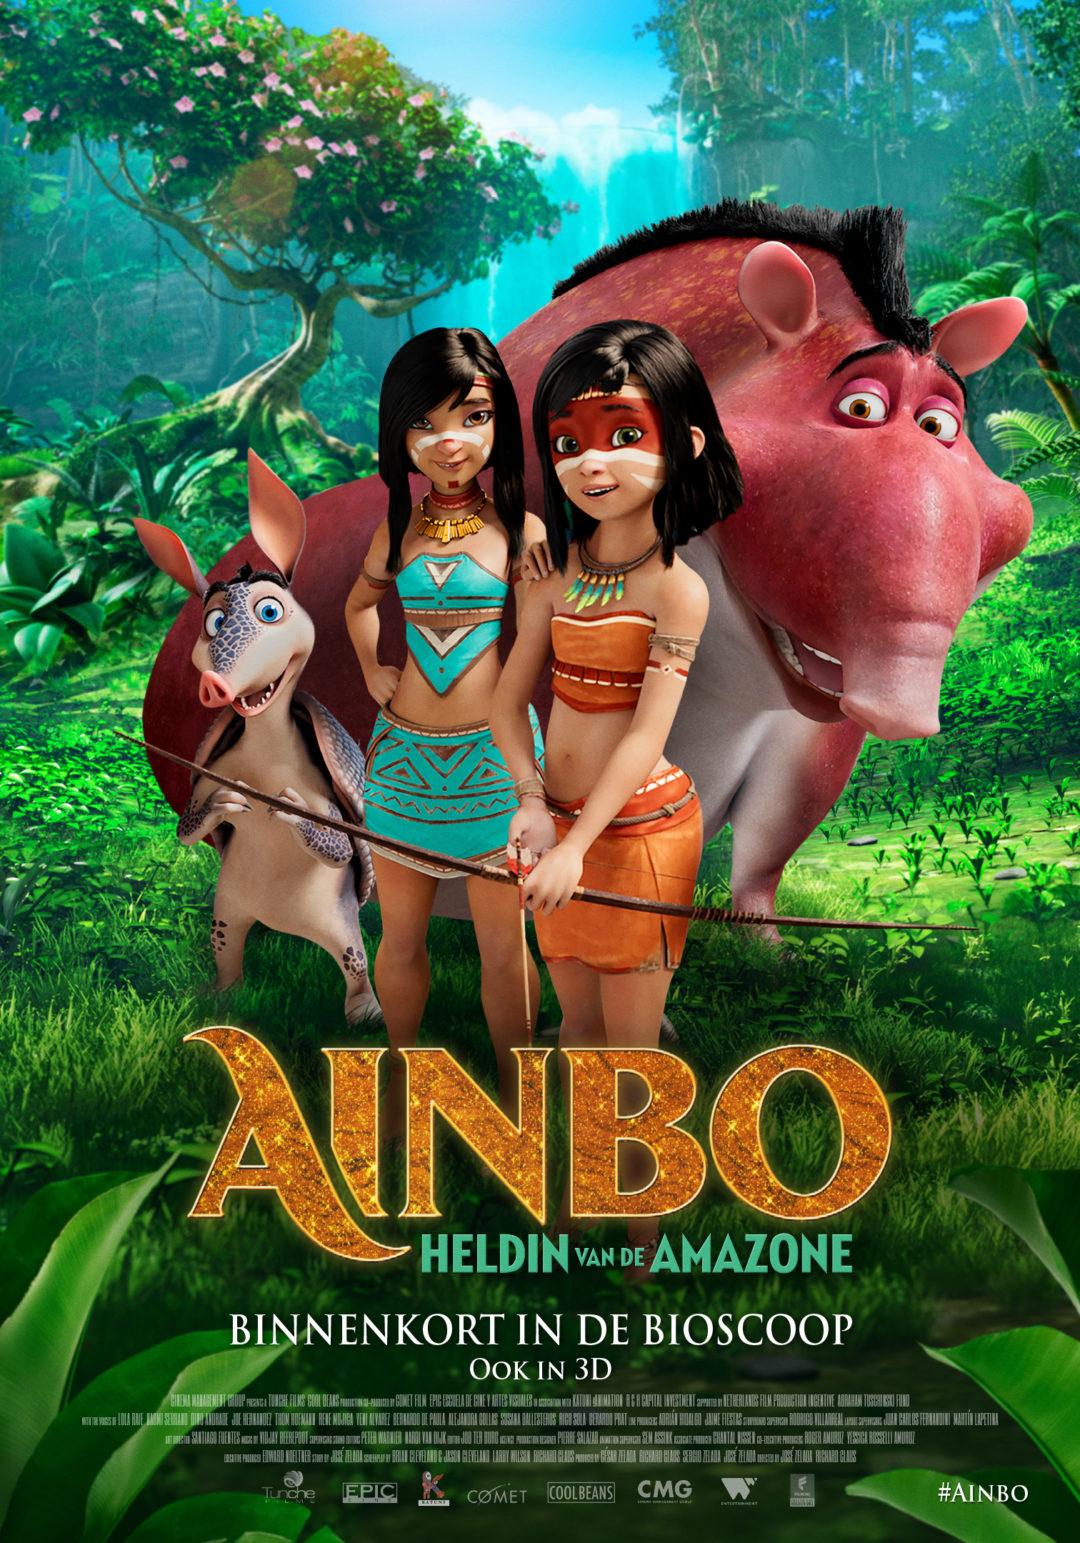 Ainbo_-Heldin-van-de-Amazone_ps_1_jpg_sd-high_Copyright-2019-WW-Entertainment.jpg